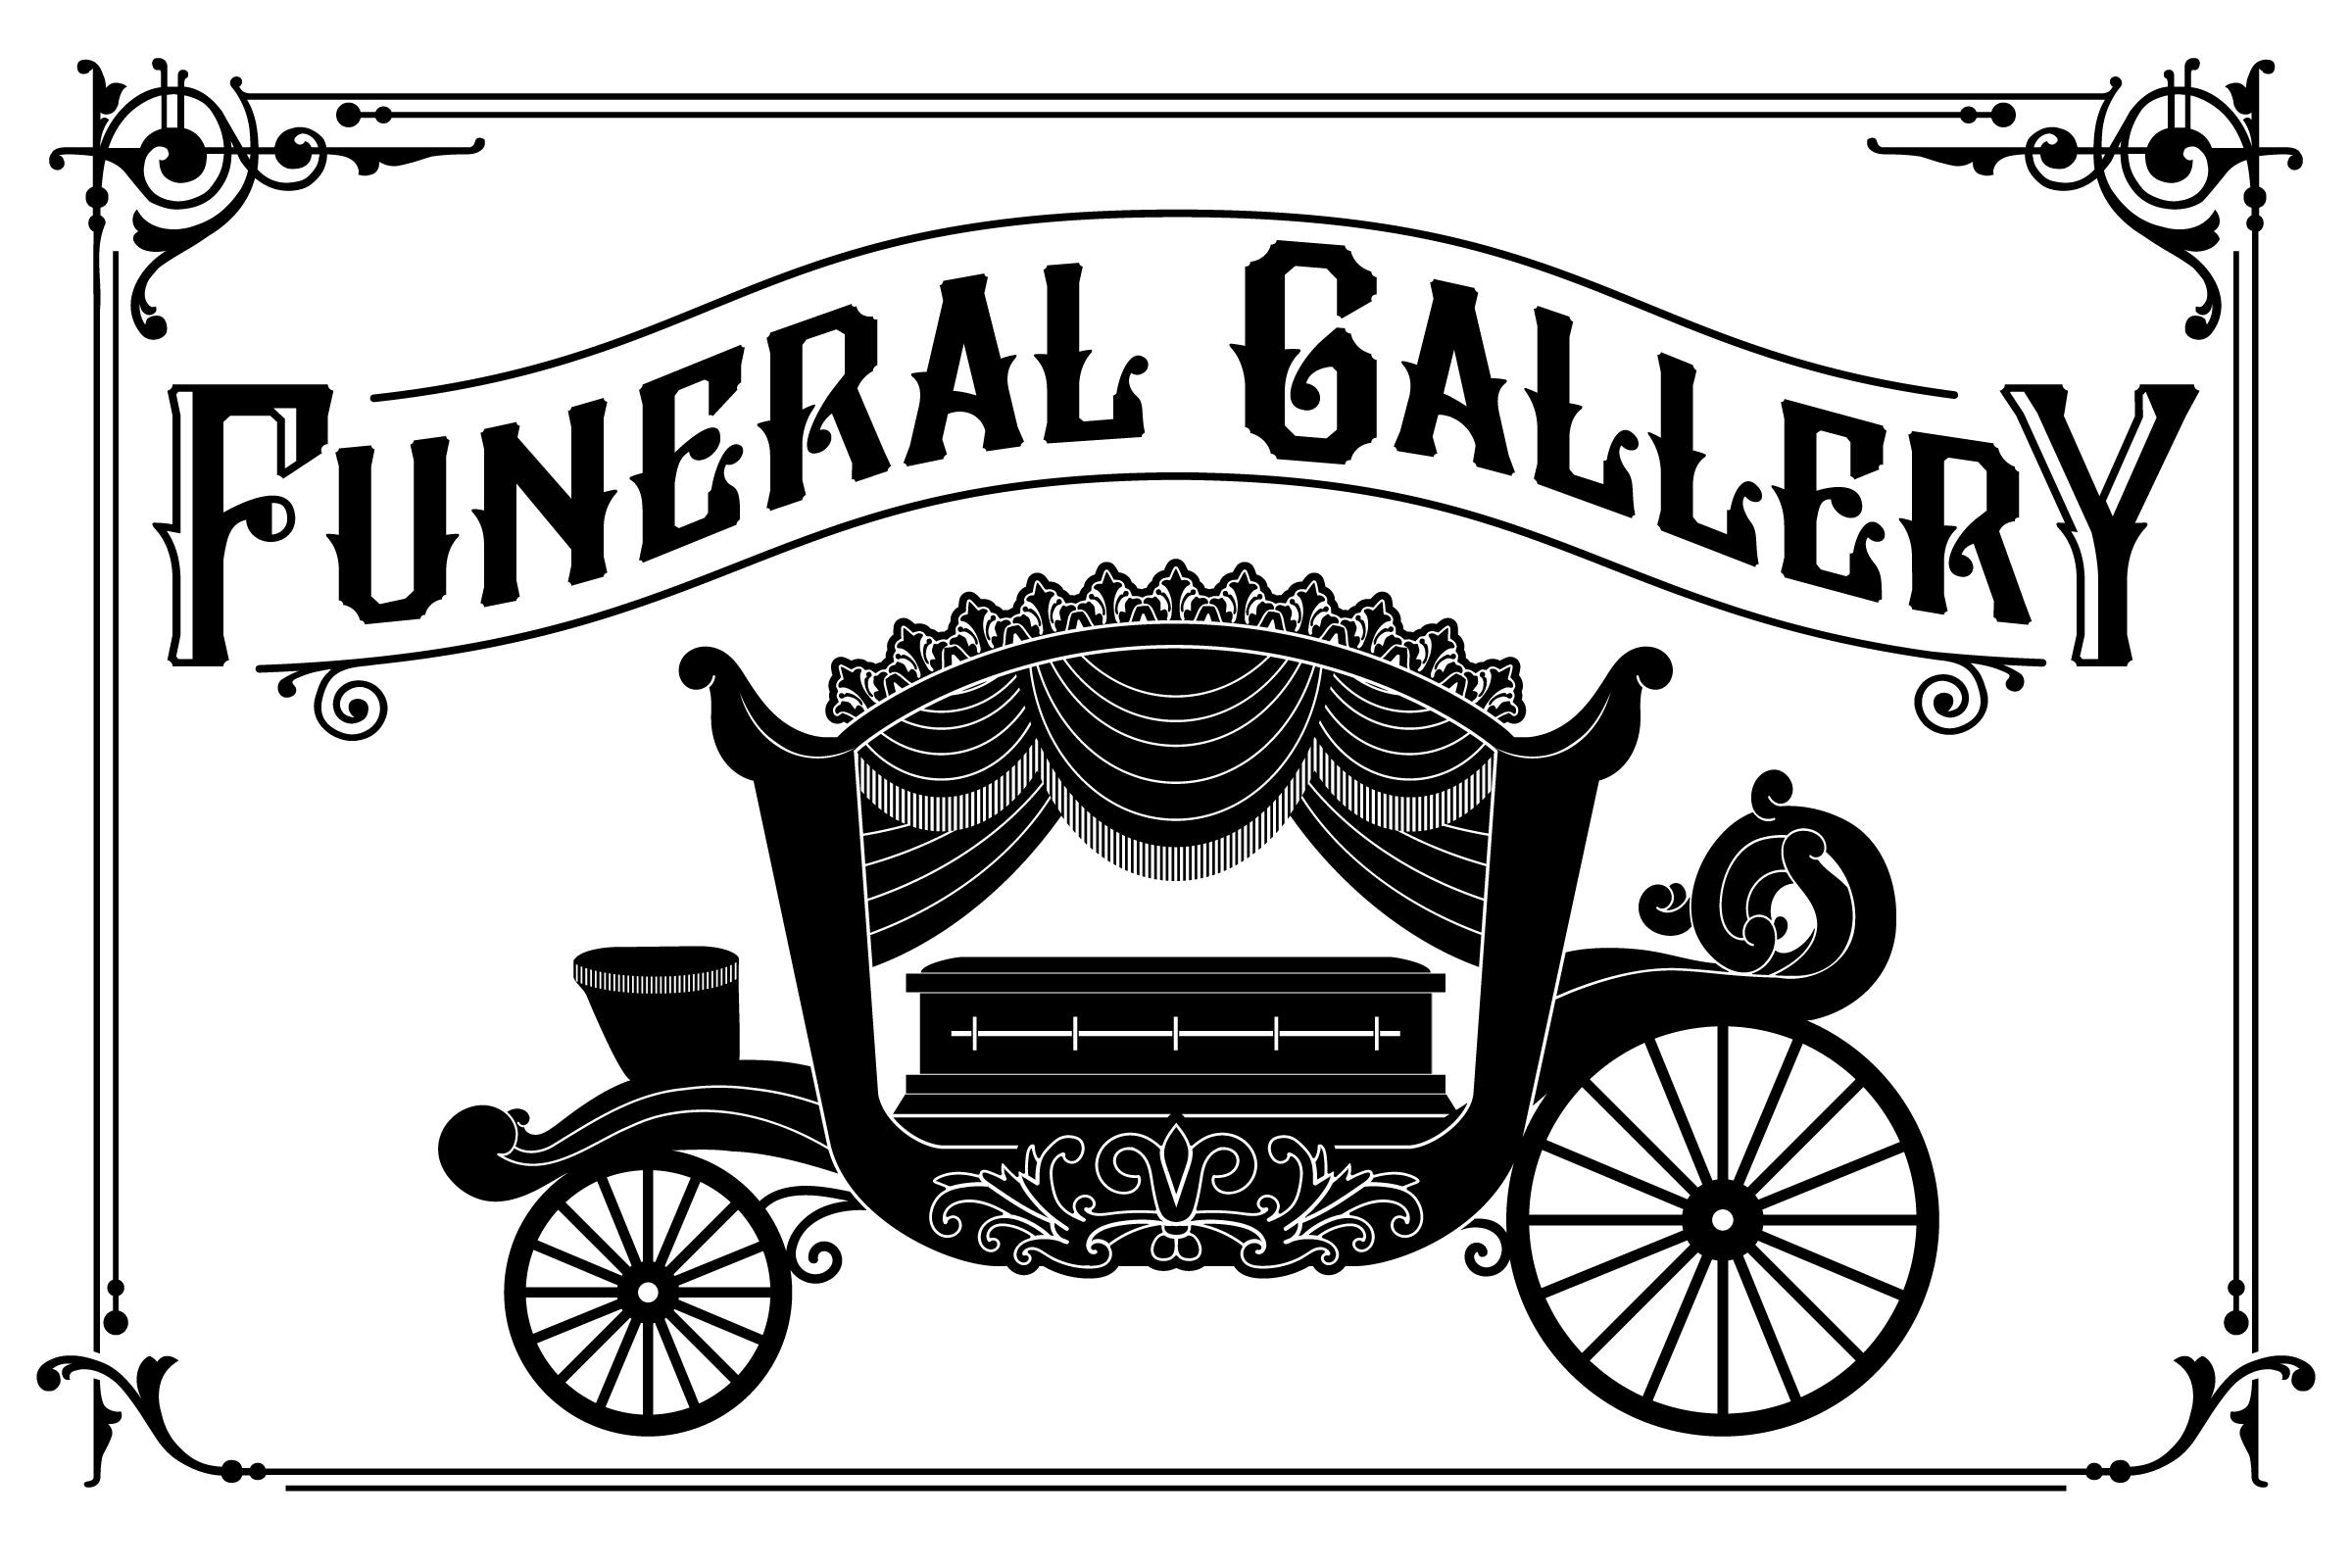 811 Royal St, New Orleans, LA 70117,www.funeralgallery.com/